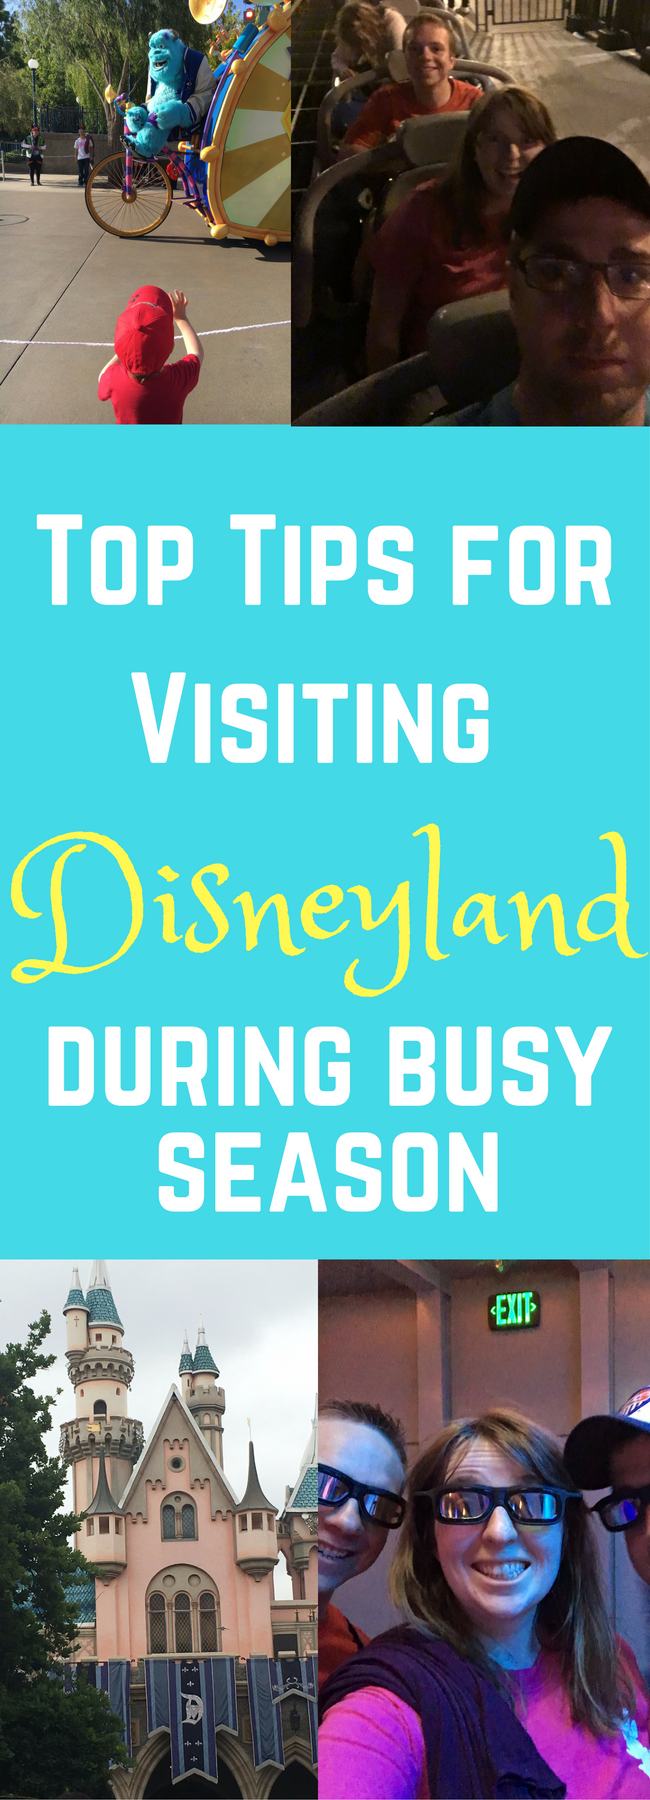 Disneyland / Disneyland Tips / Tips for Visiting Disneyland / Disneyland During the Summer / Best times to visit disneyland / disneyland advice / disneyland secrets / disneyland california / disneyland   tips, tricks & secrets